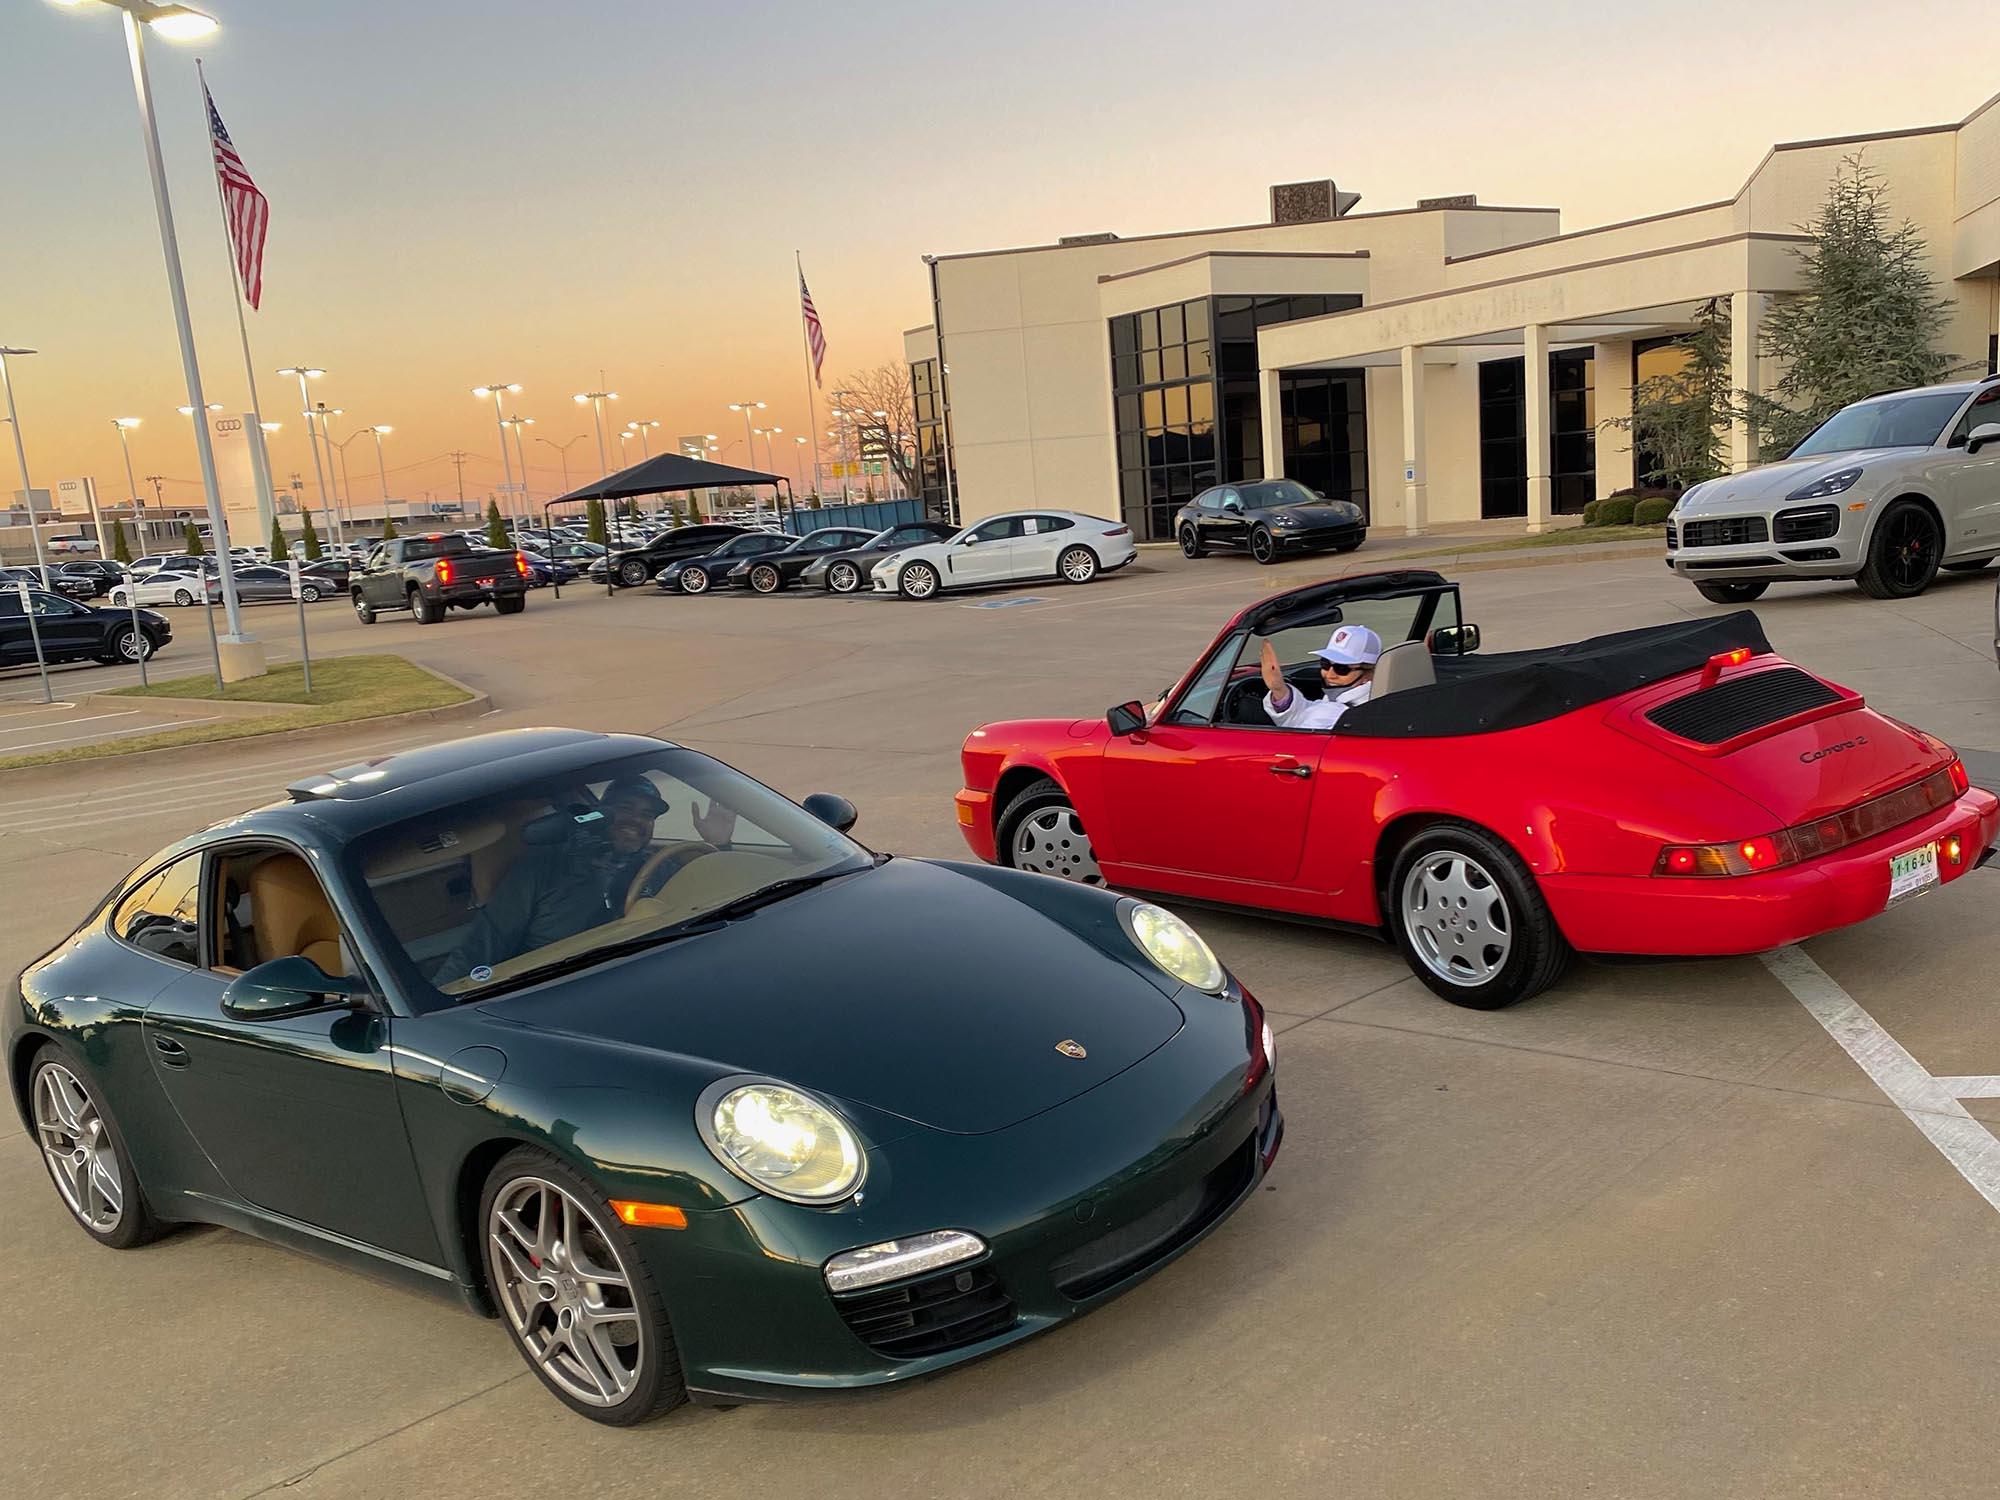 1990 Porsche 911 C2 Cab and 2009 911 Carrera S Coupe